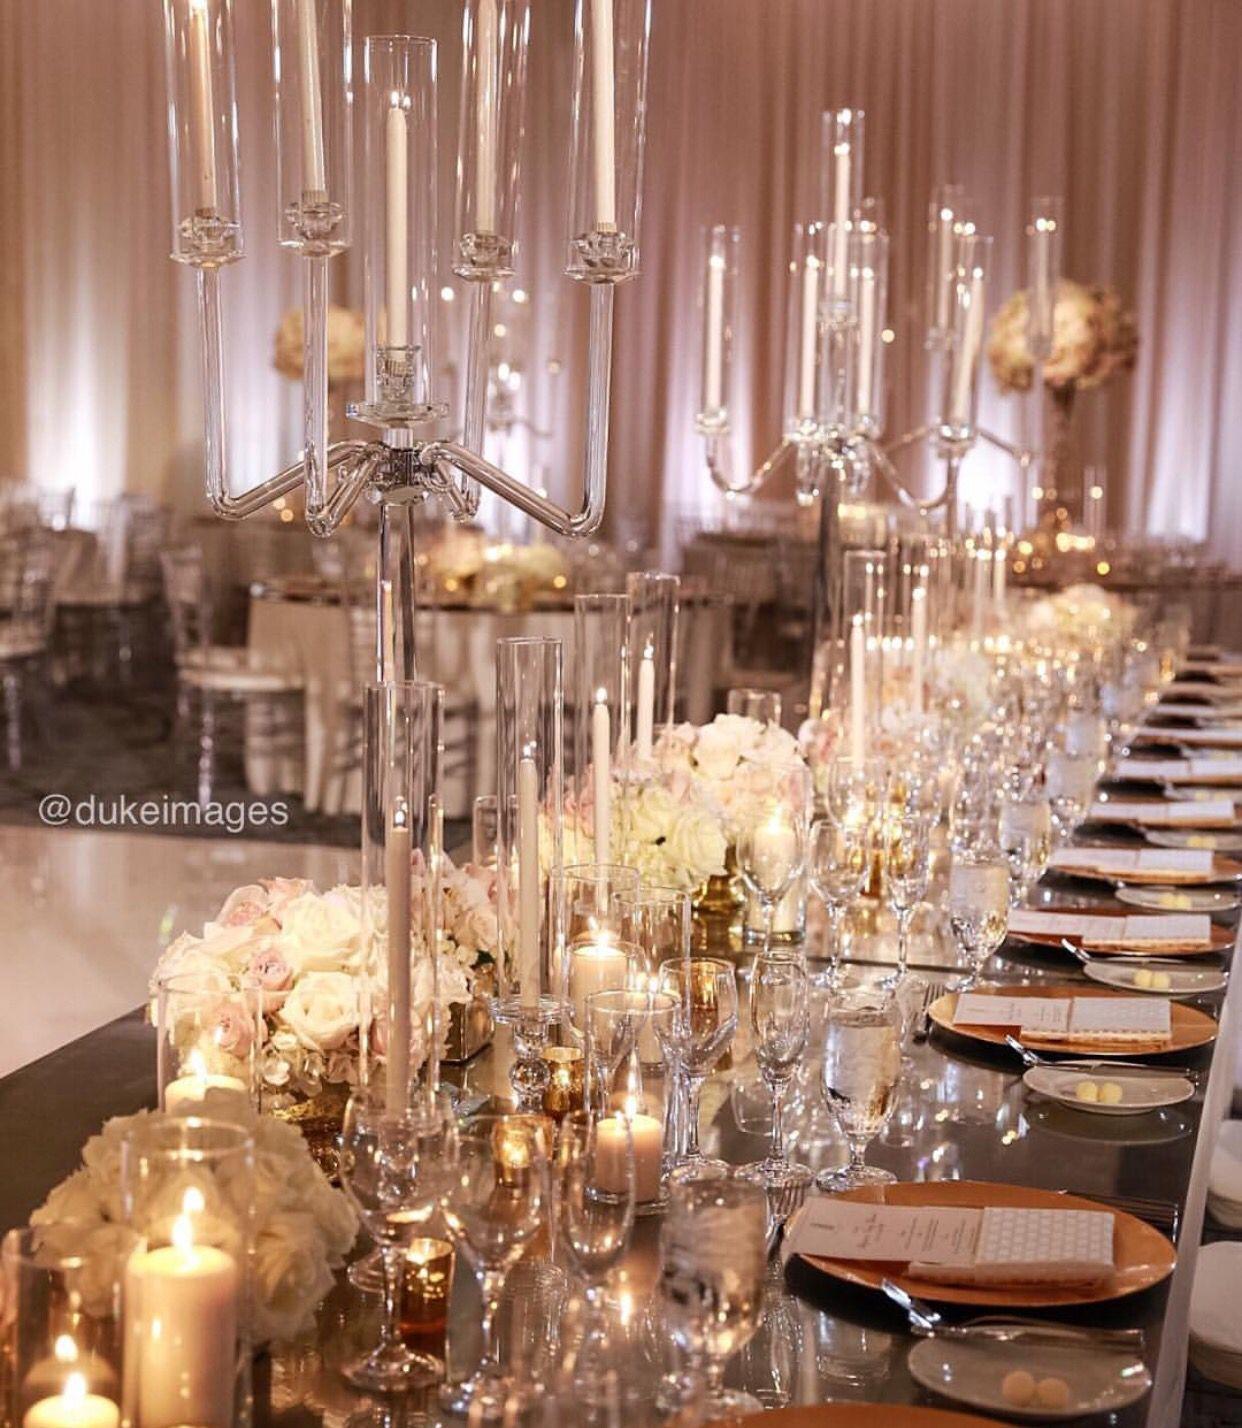 Destination Wedding Reception Ideas: Pin By Jonathan On Wedding In 2019